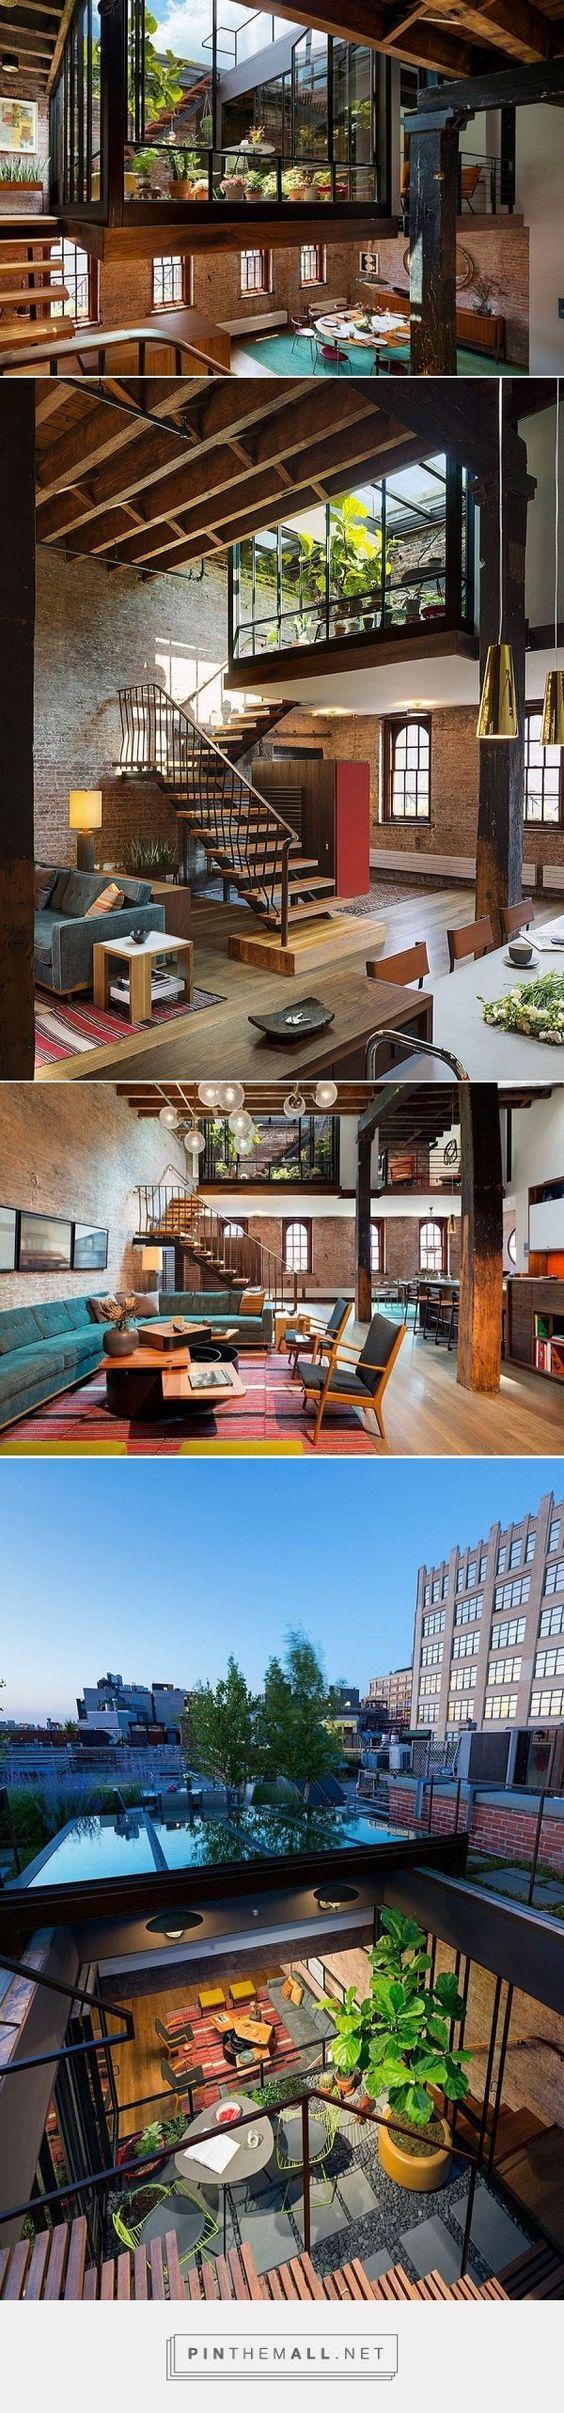 best インテリア images on pinterest home ideas interior